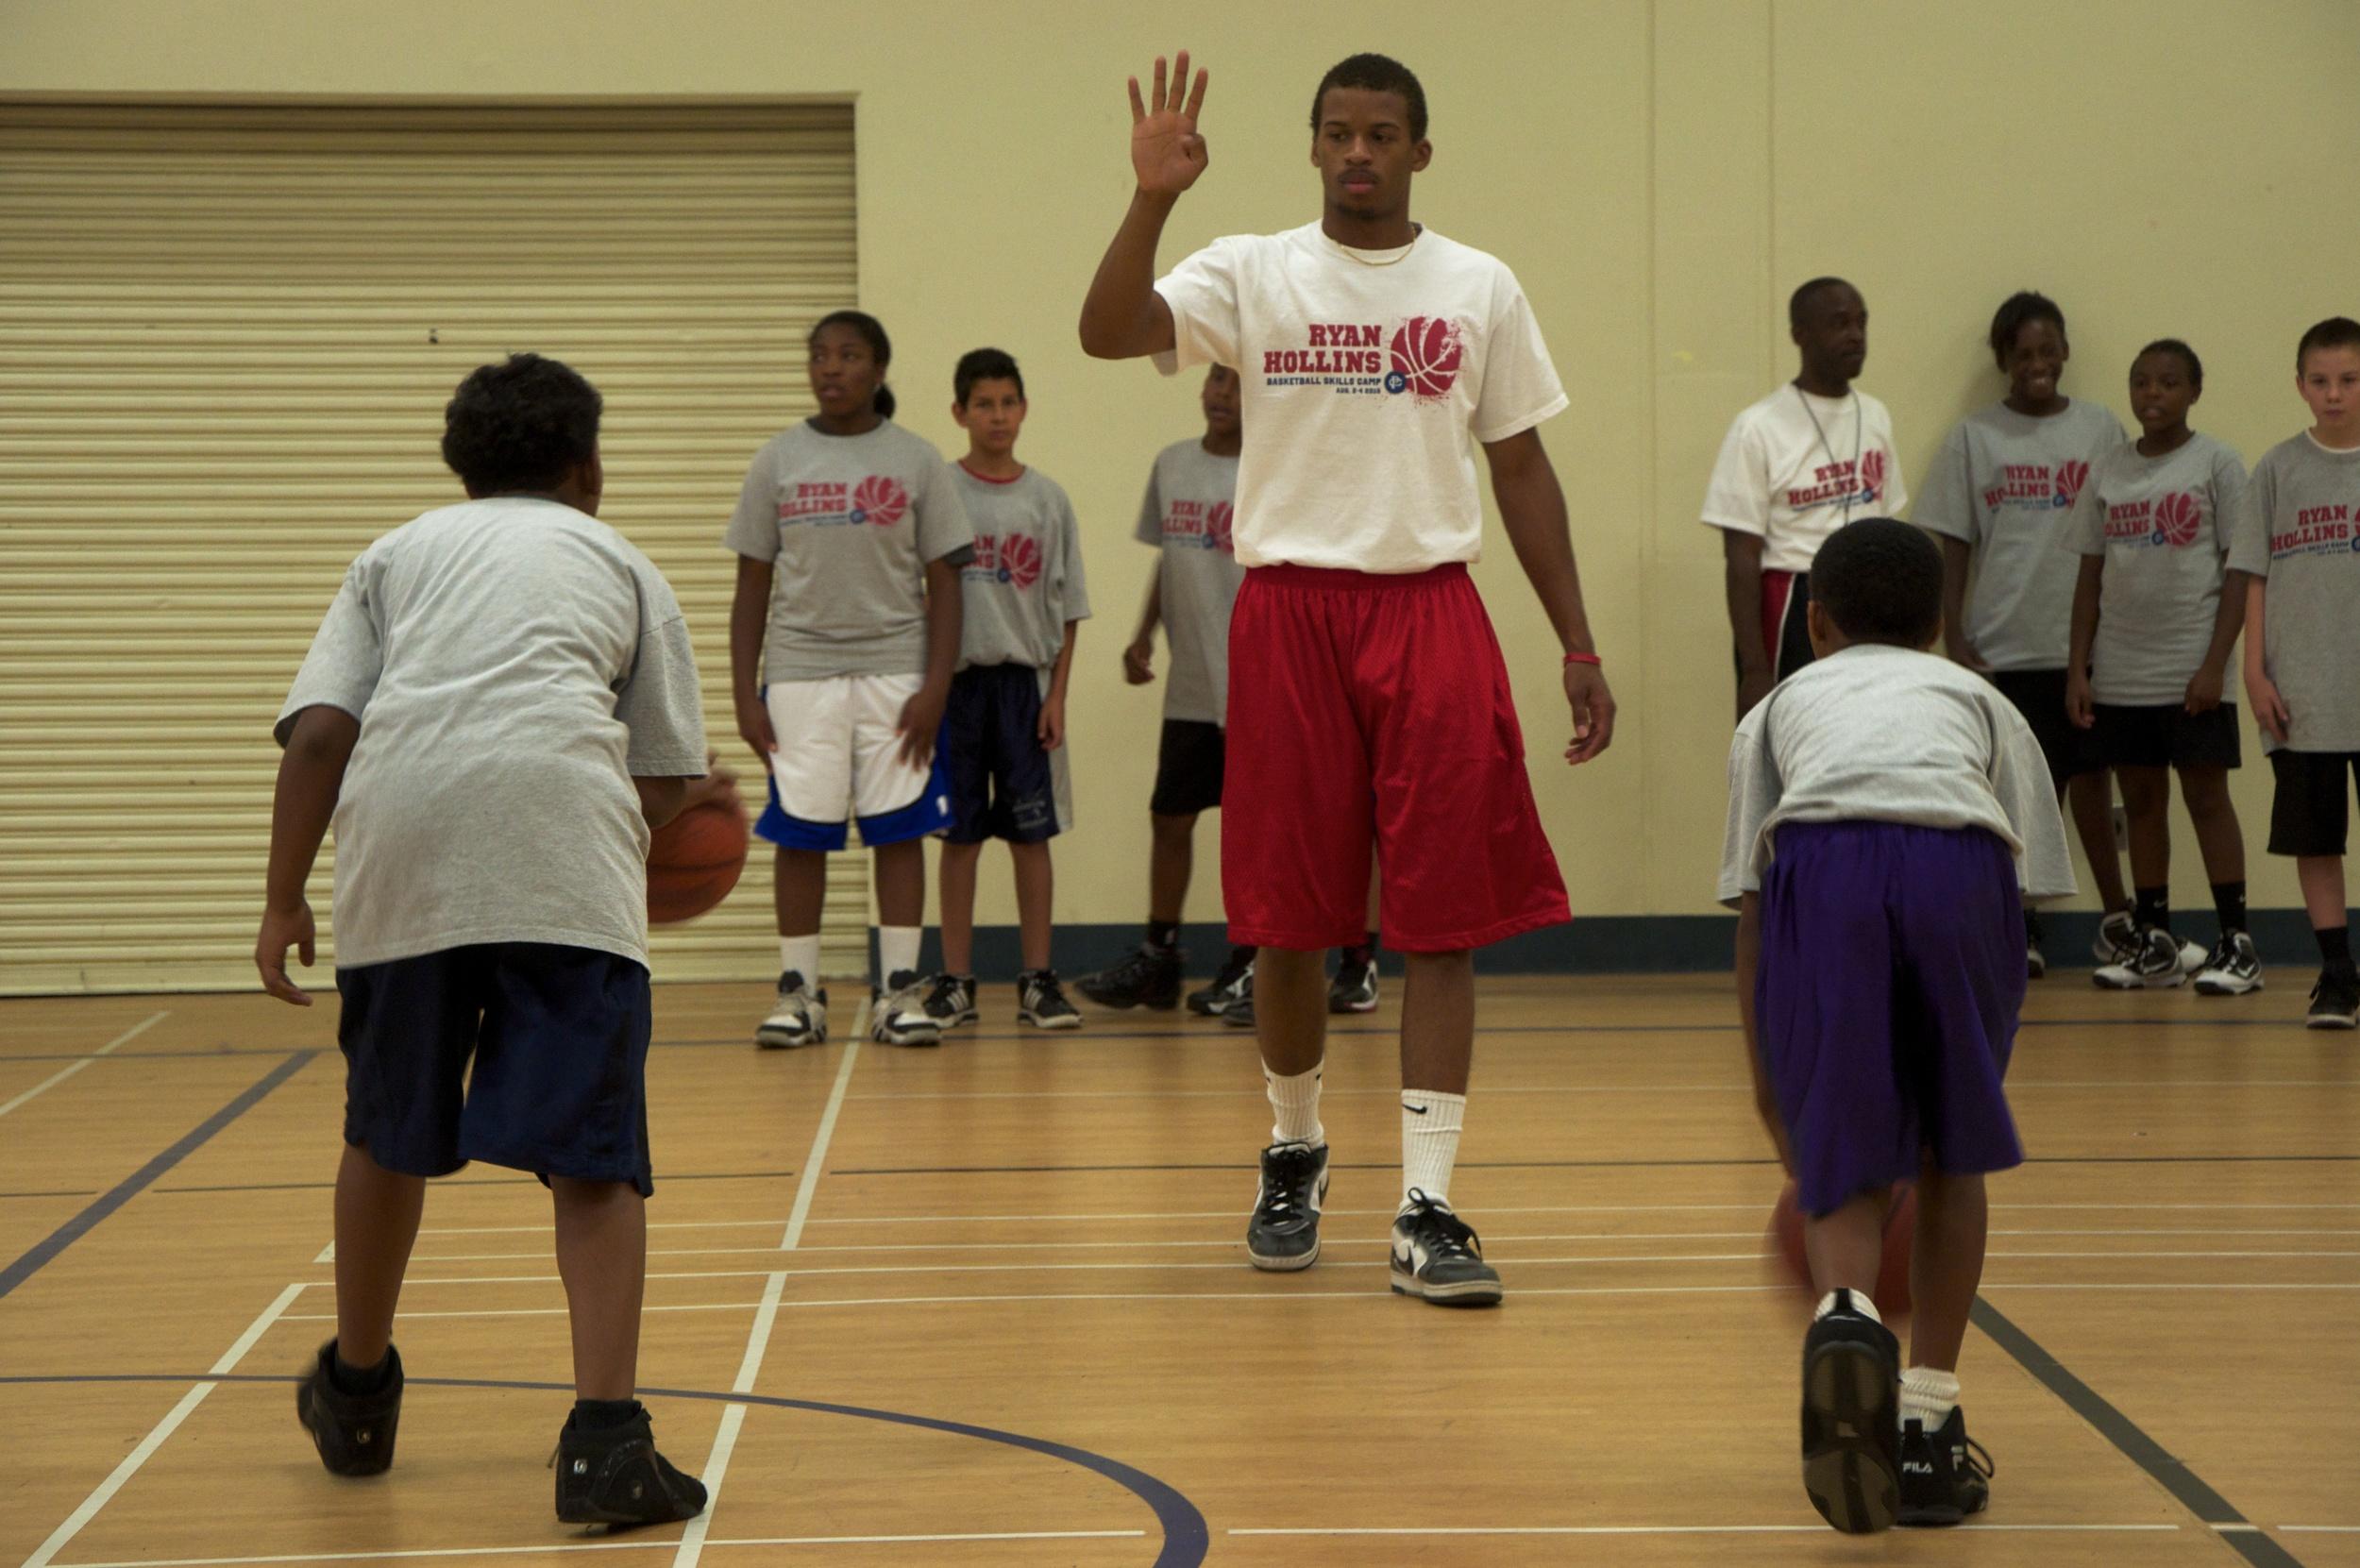 Ryan Hollins Basketball Camp 2.jpg